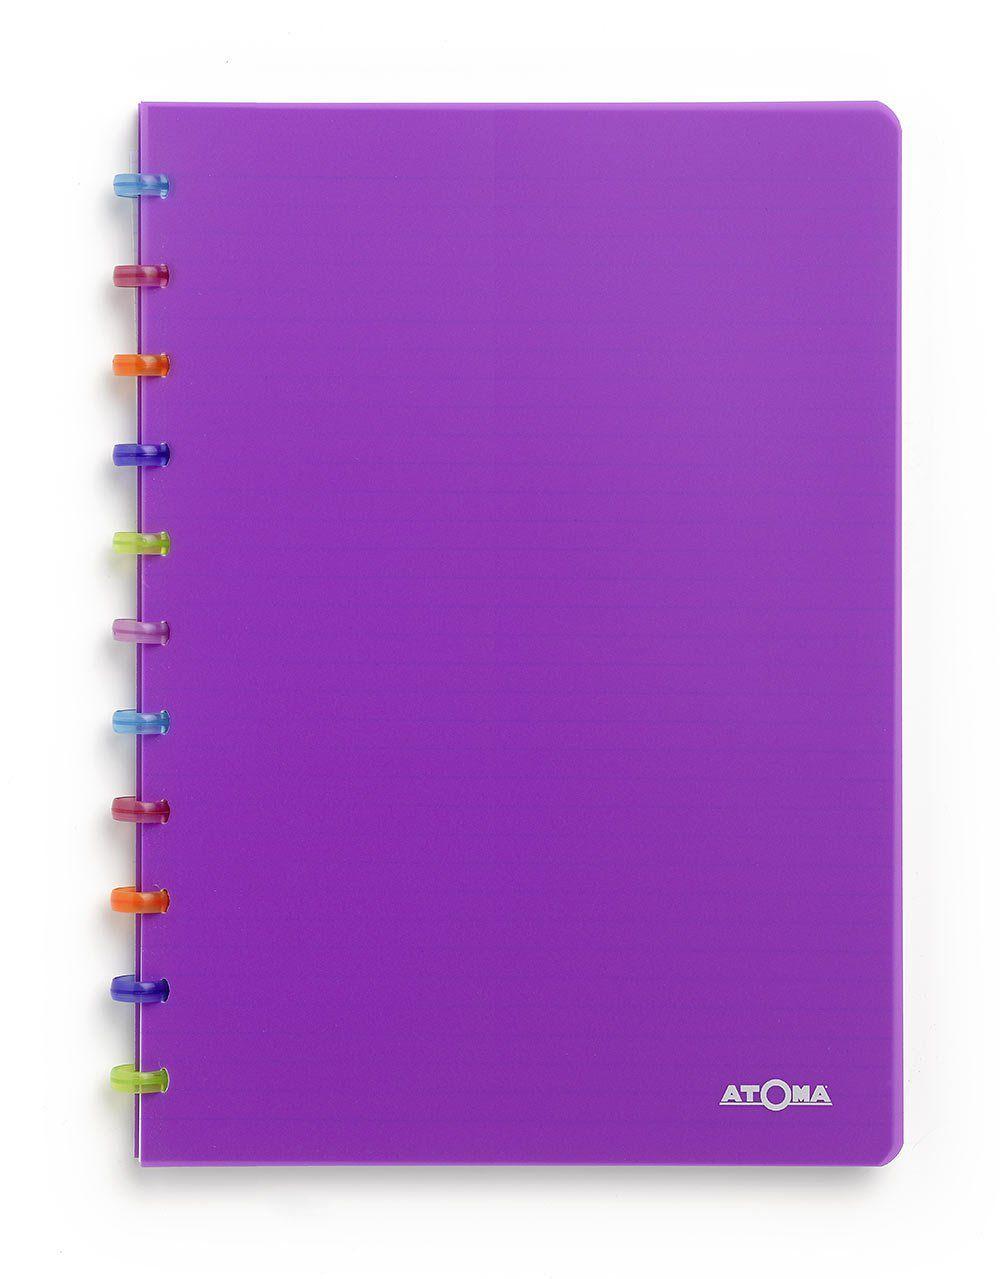 Caderno A4 72 fls roxo TUTTI FRUTI Atoma